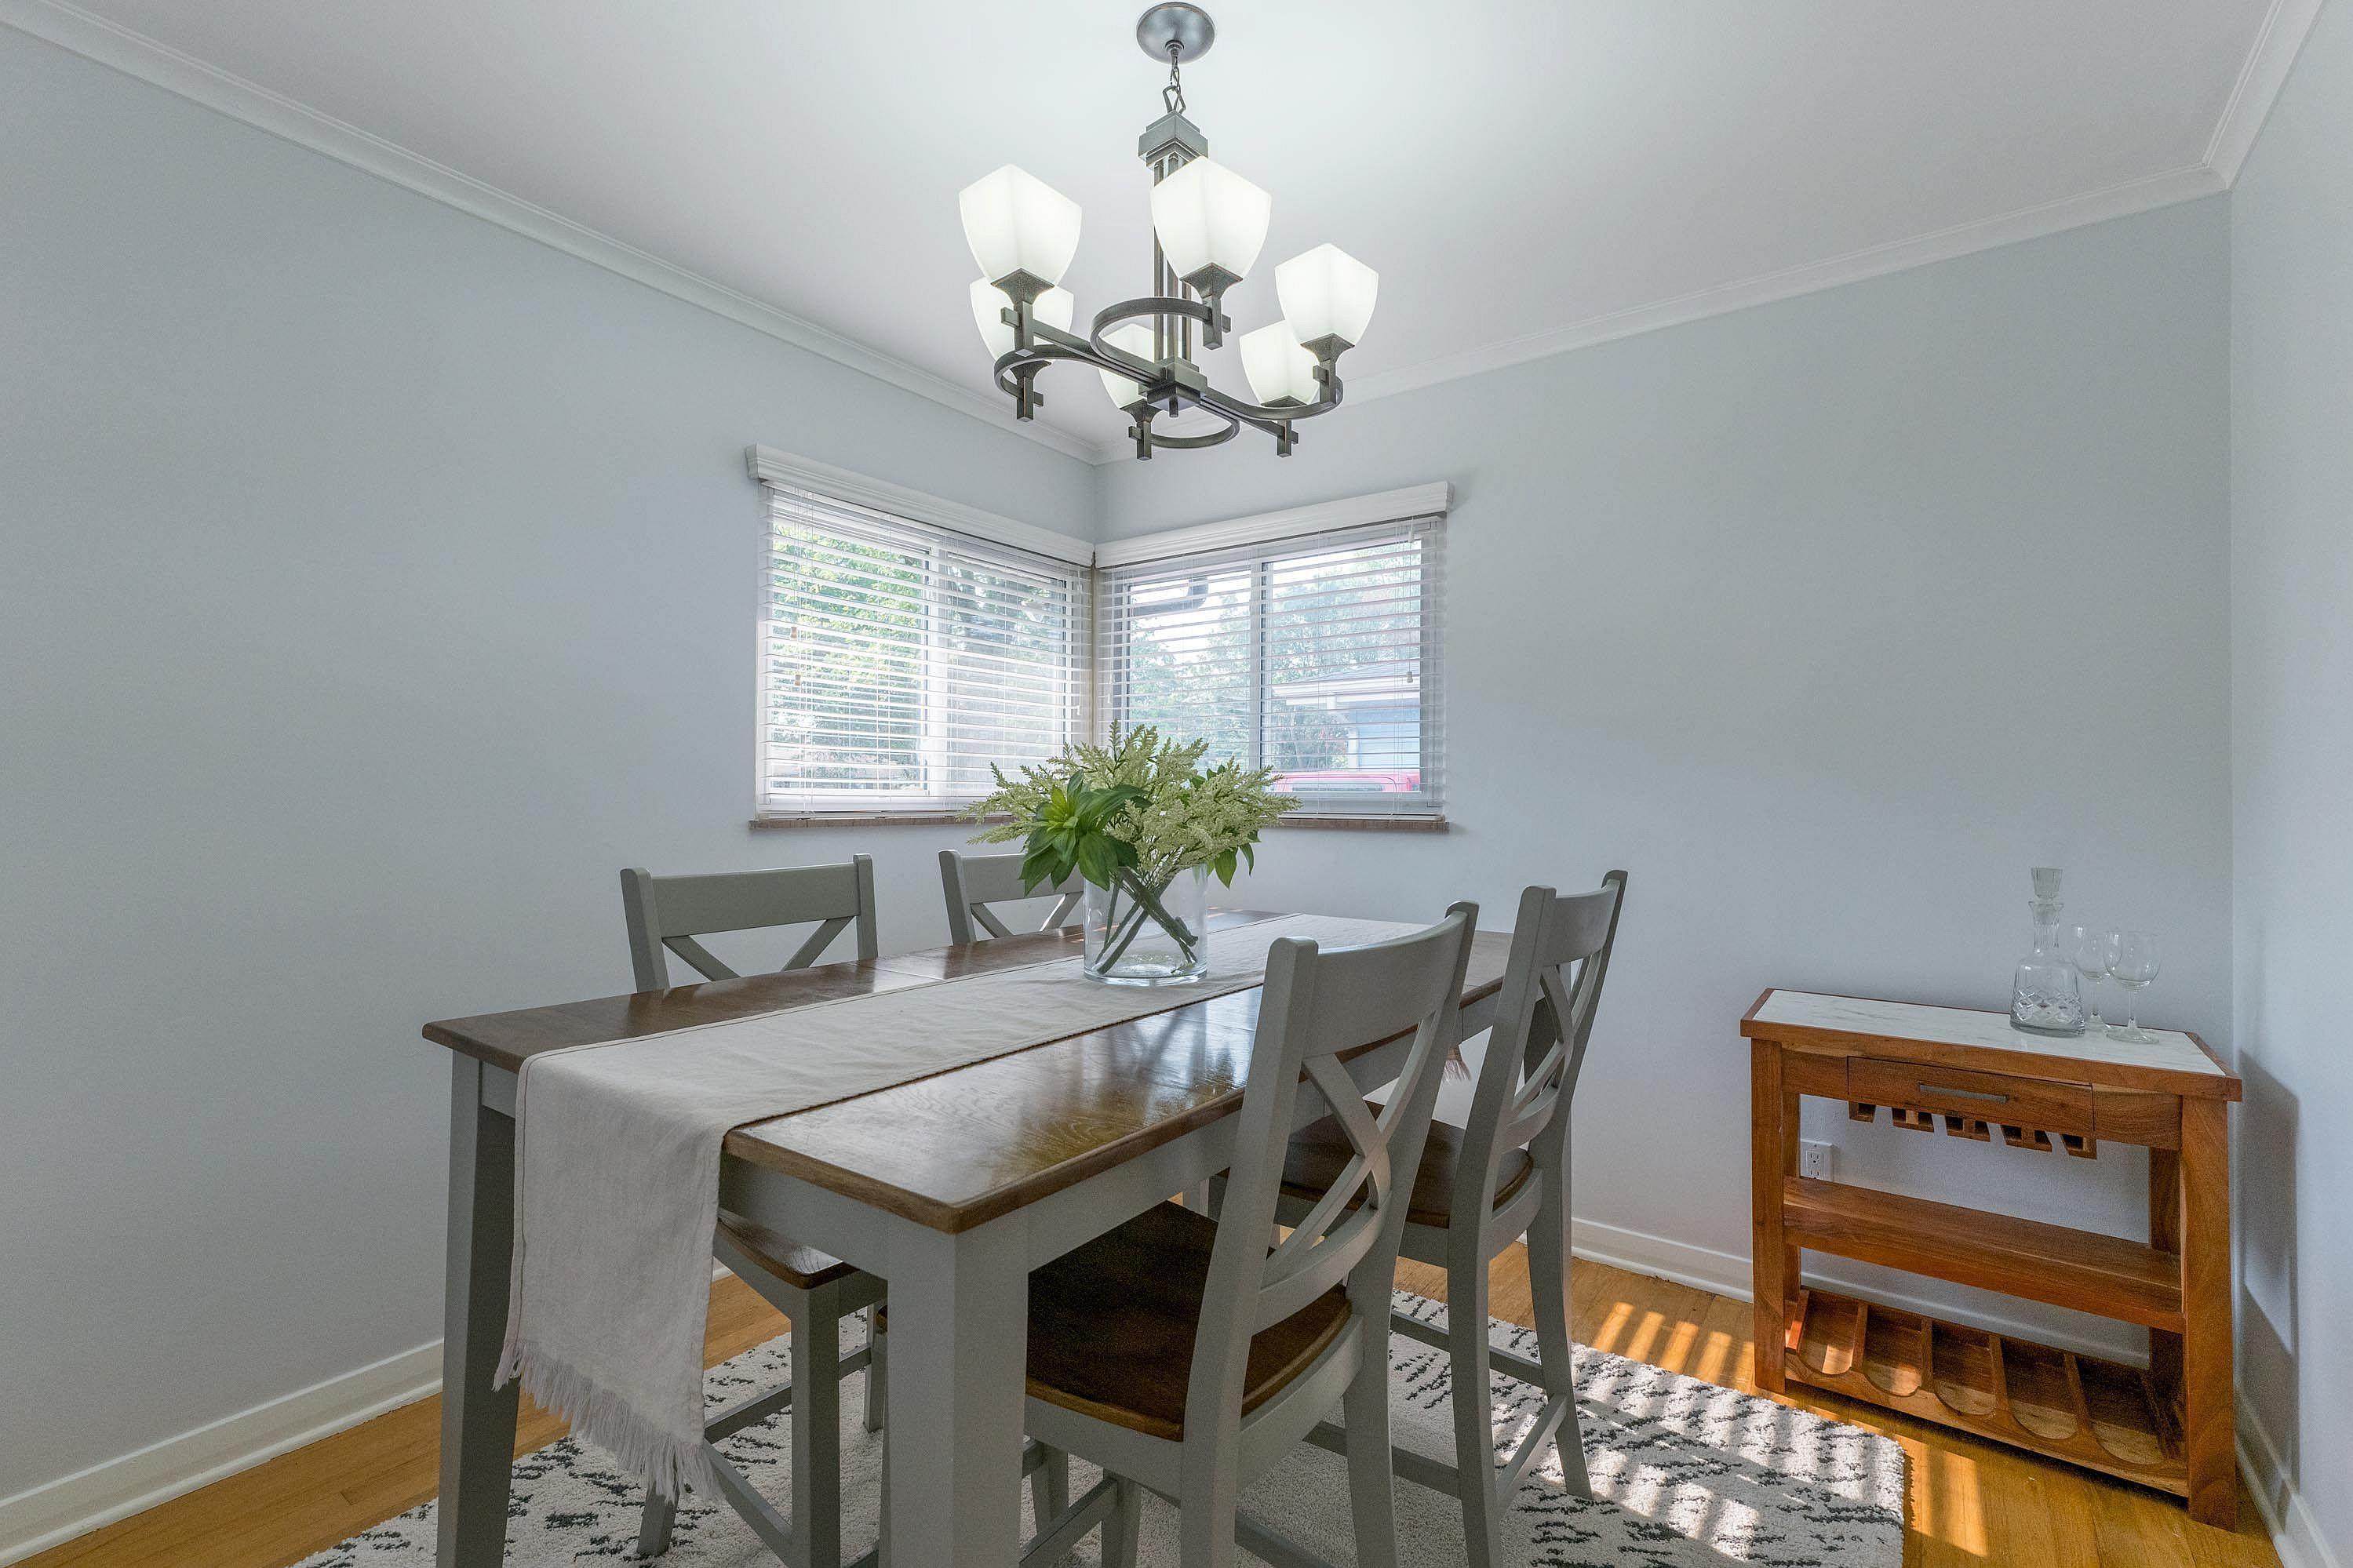 Dining room has natural light